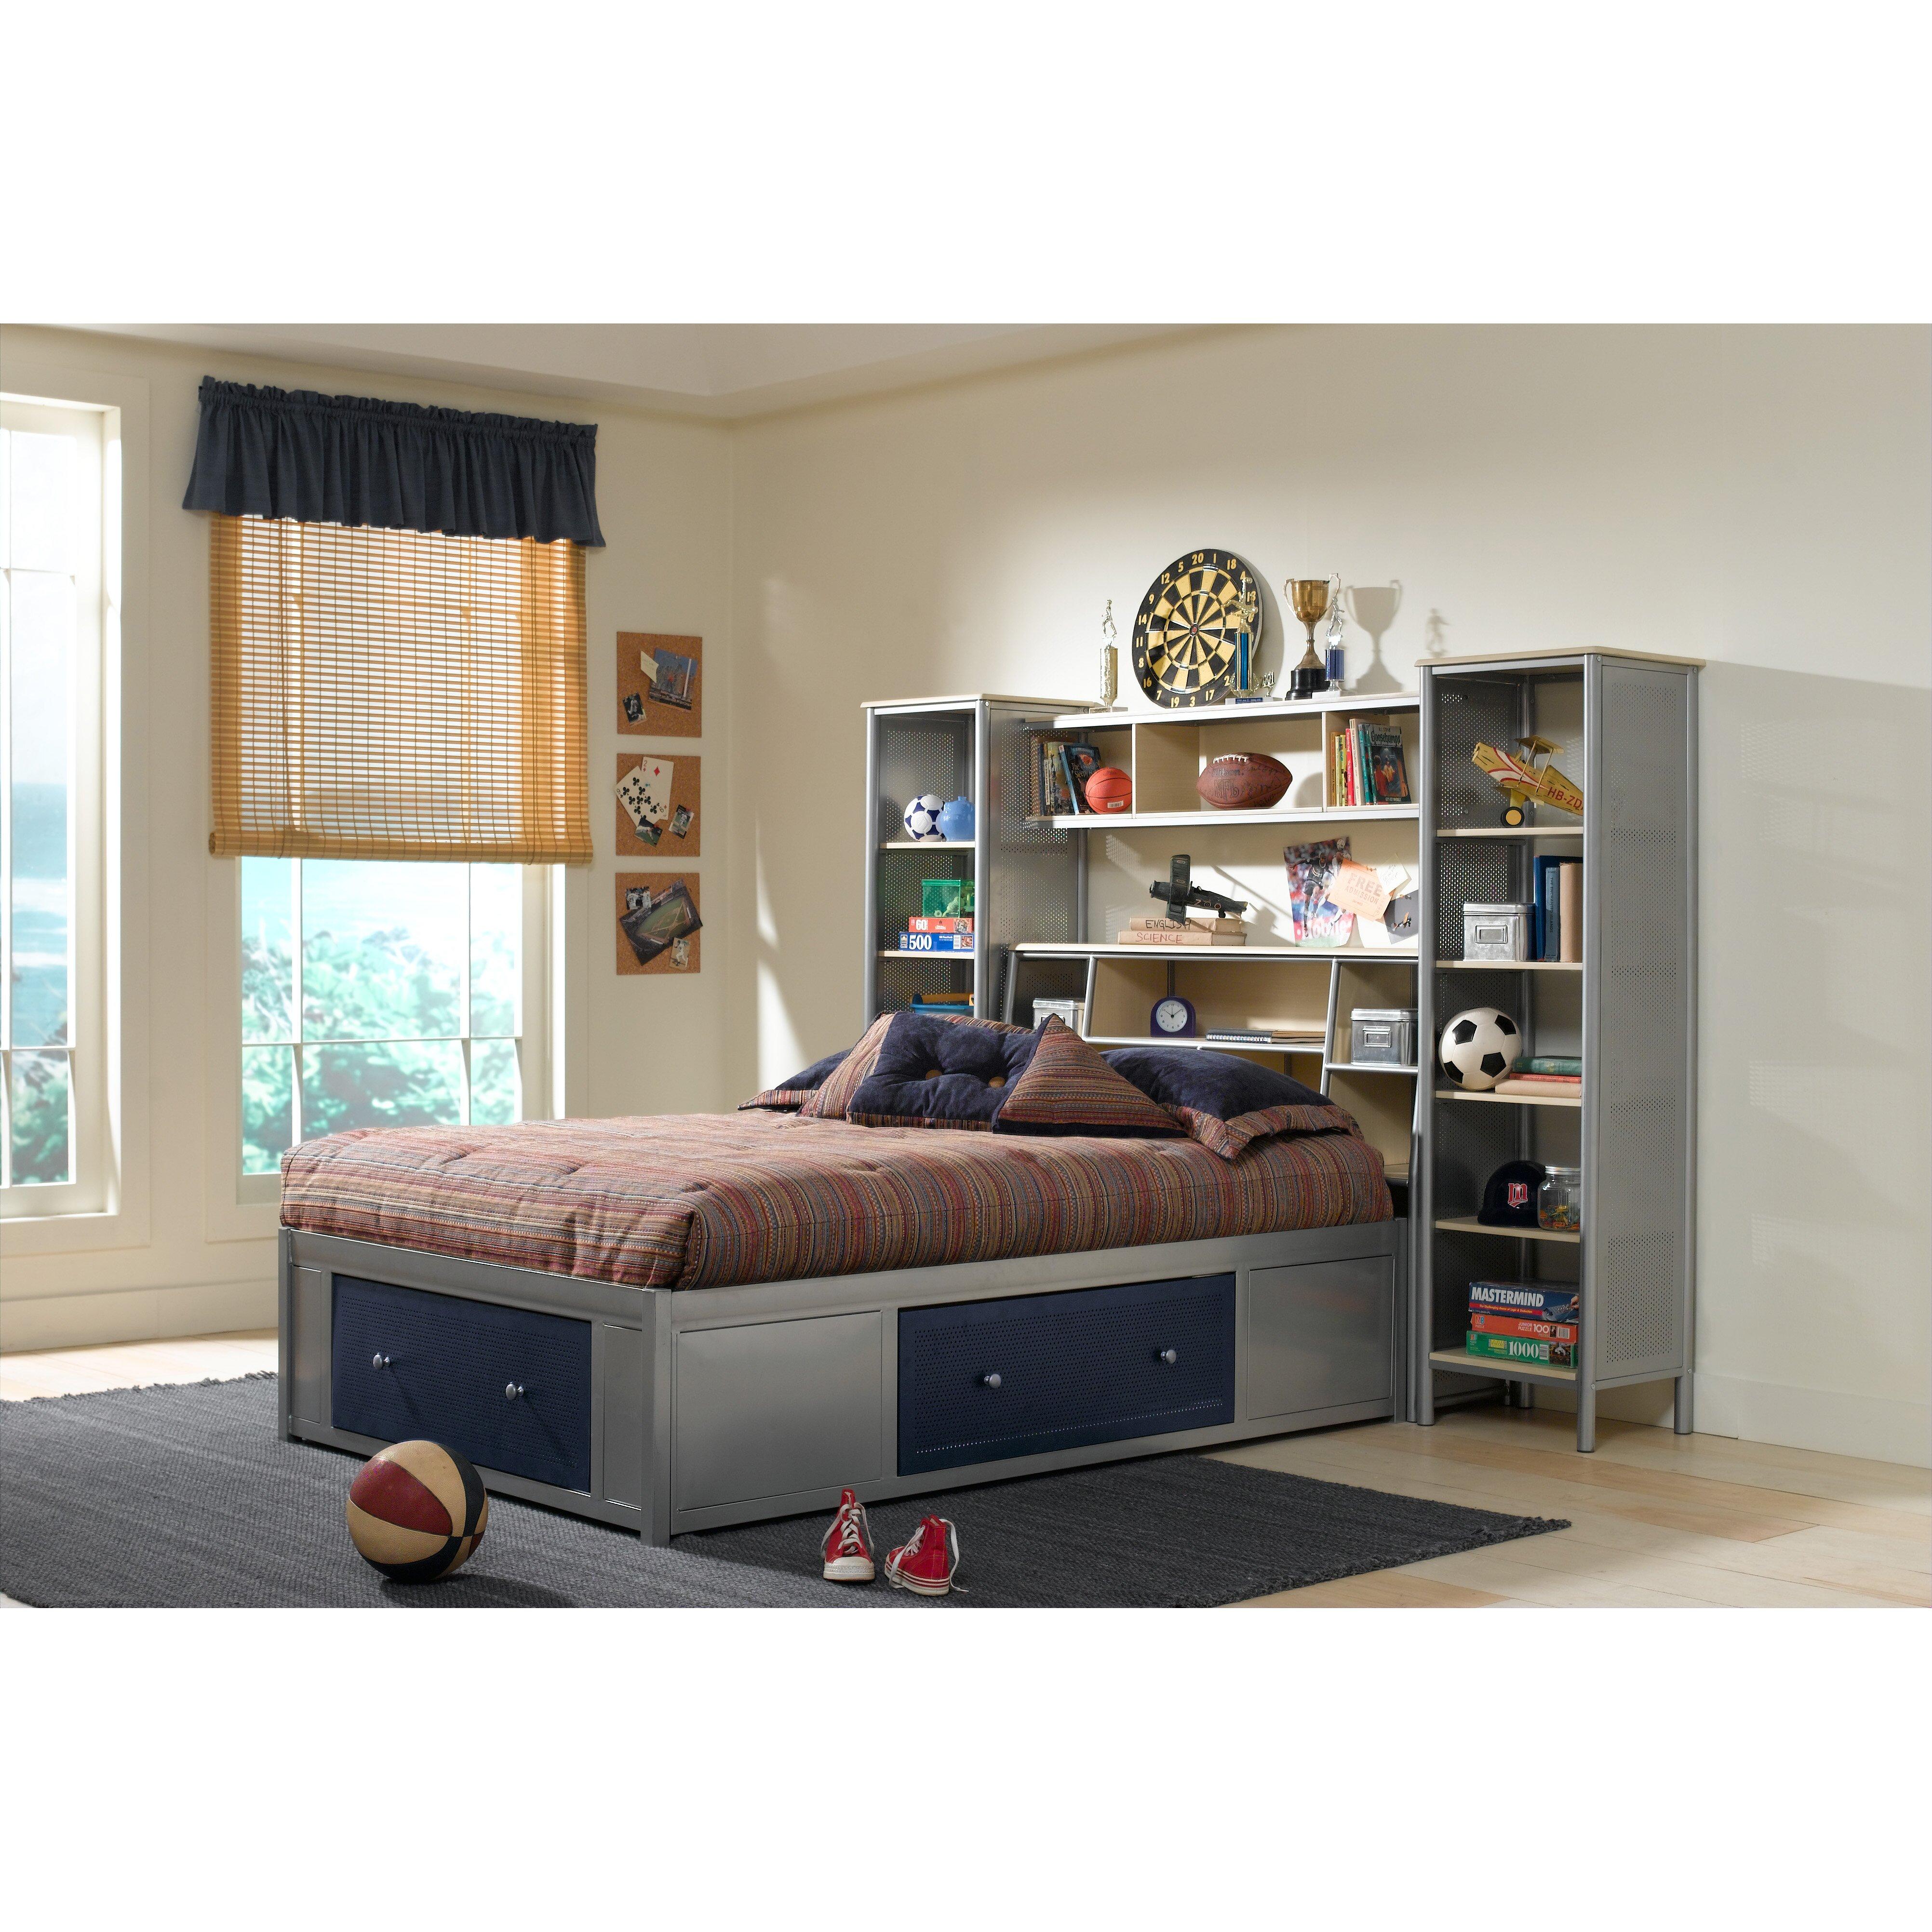 Hillsdale Universal Youth Platform 3 Piece Bedroom Set